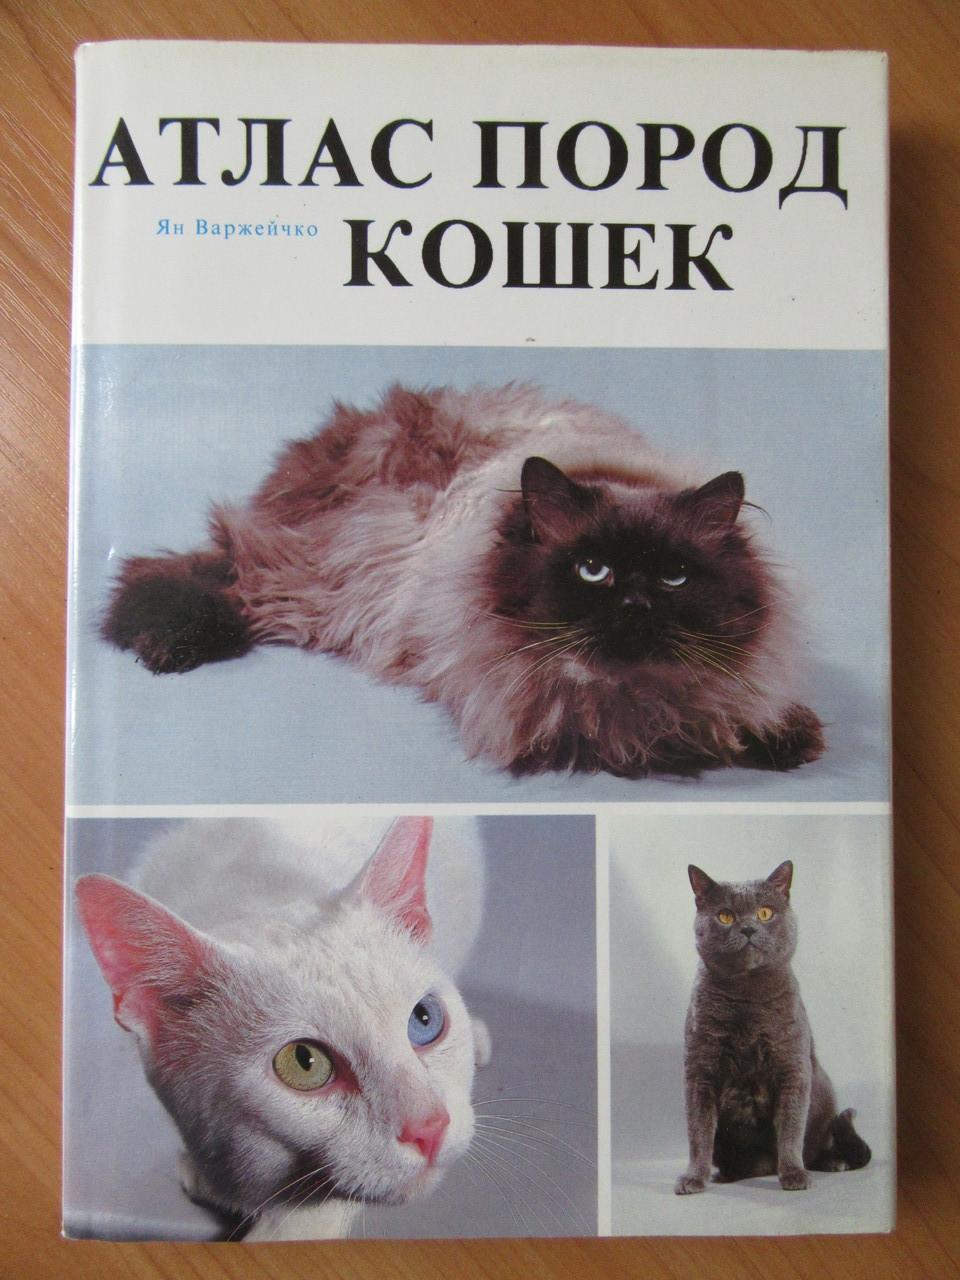 Ян Варжейчко. Атлас пород кошек